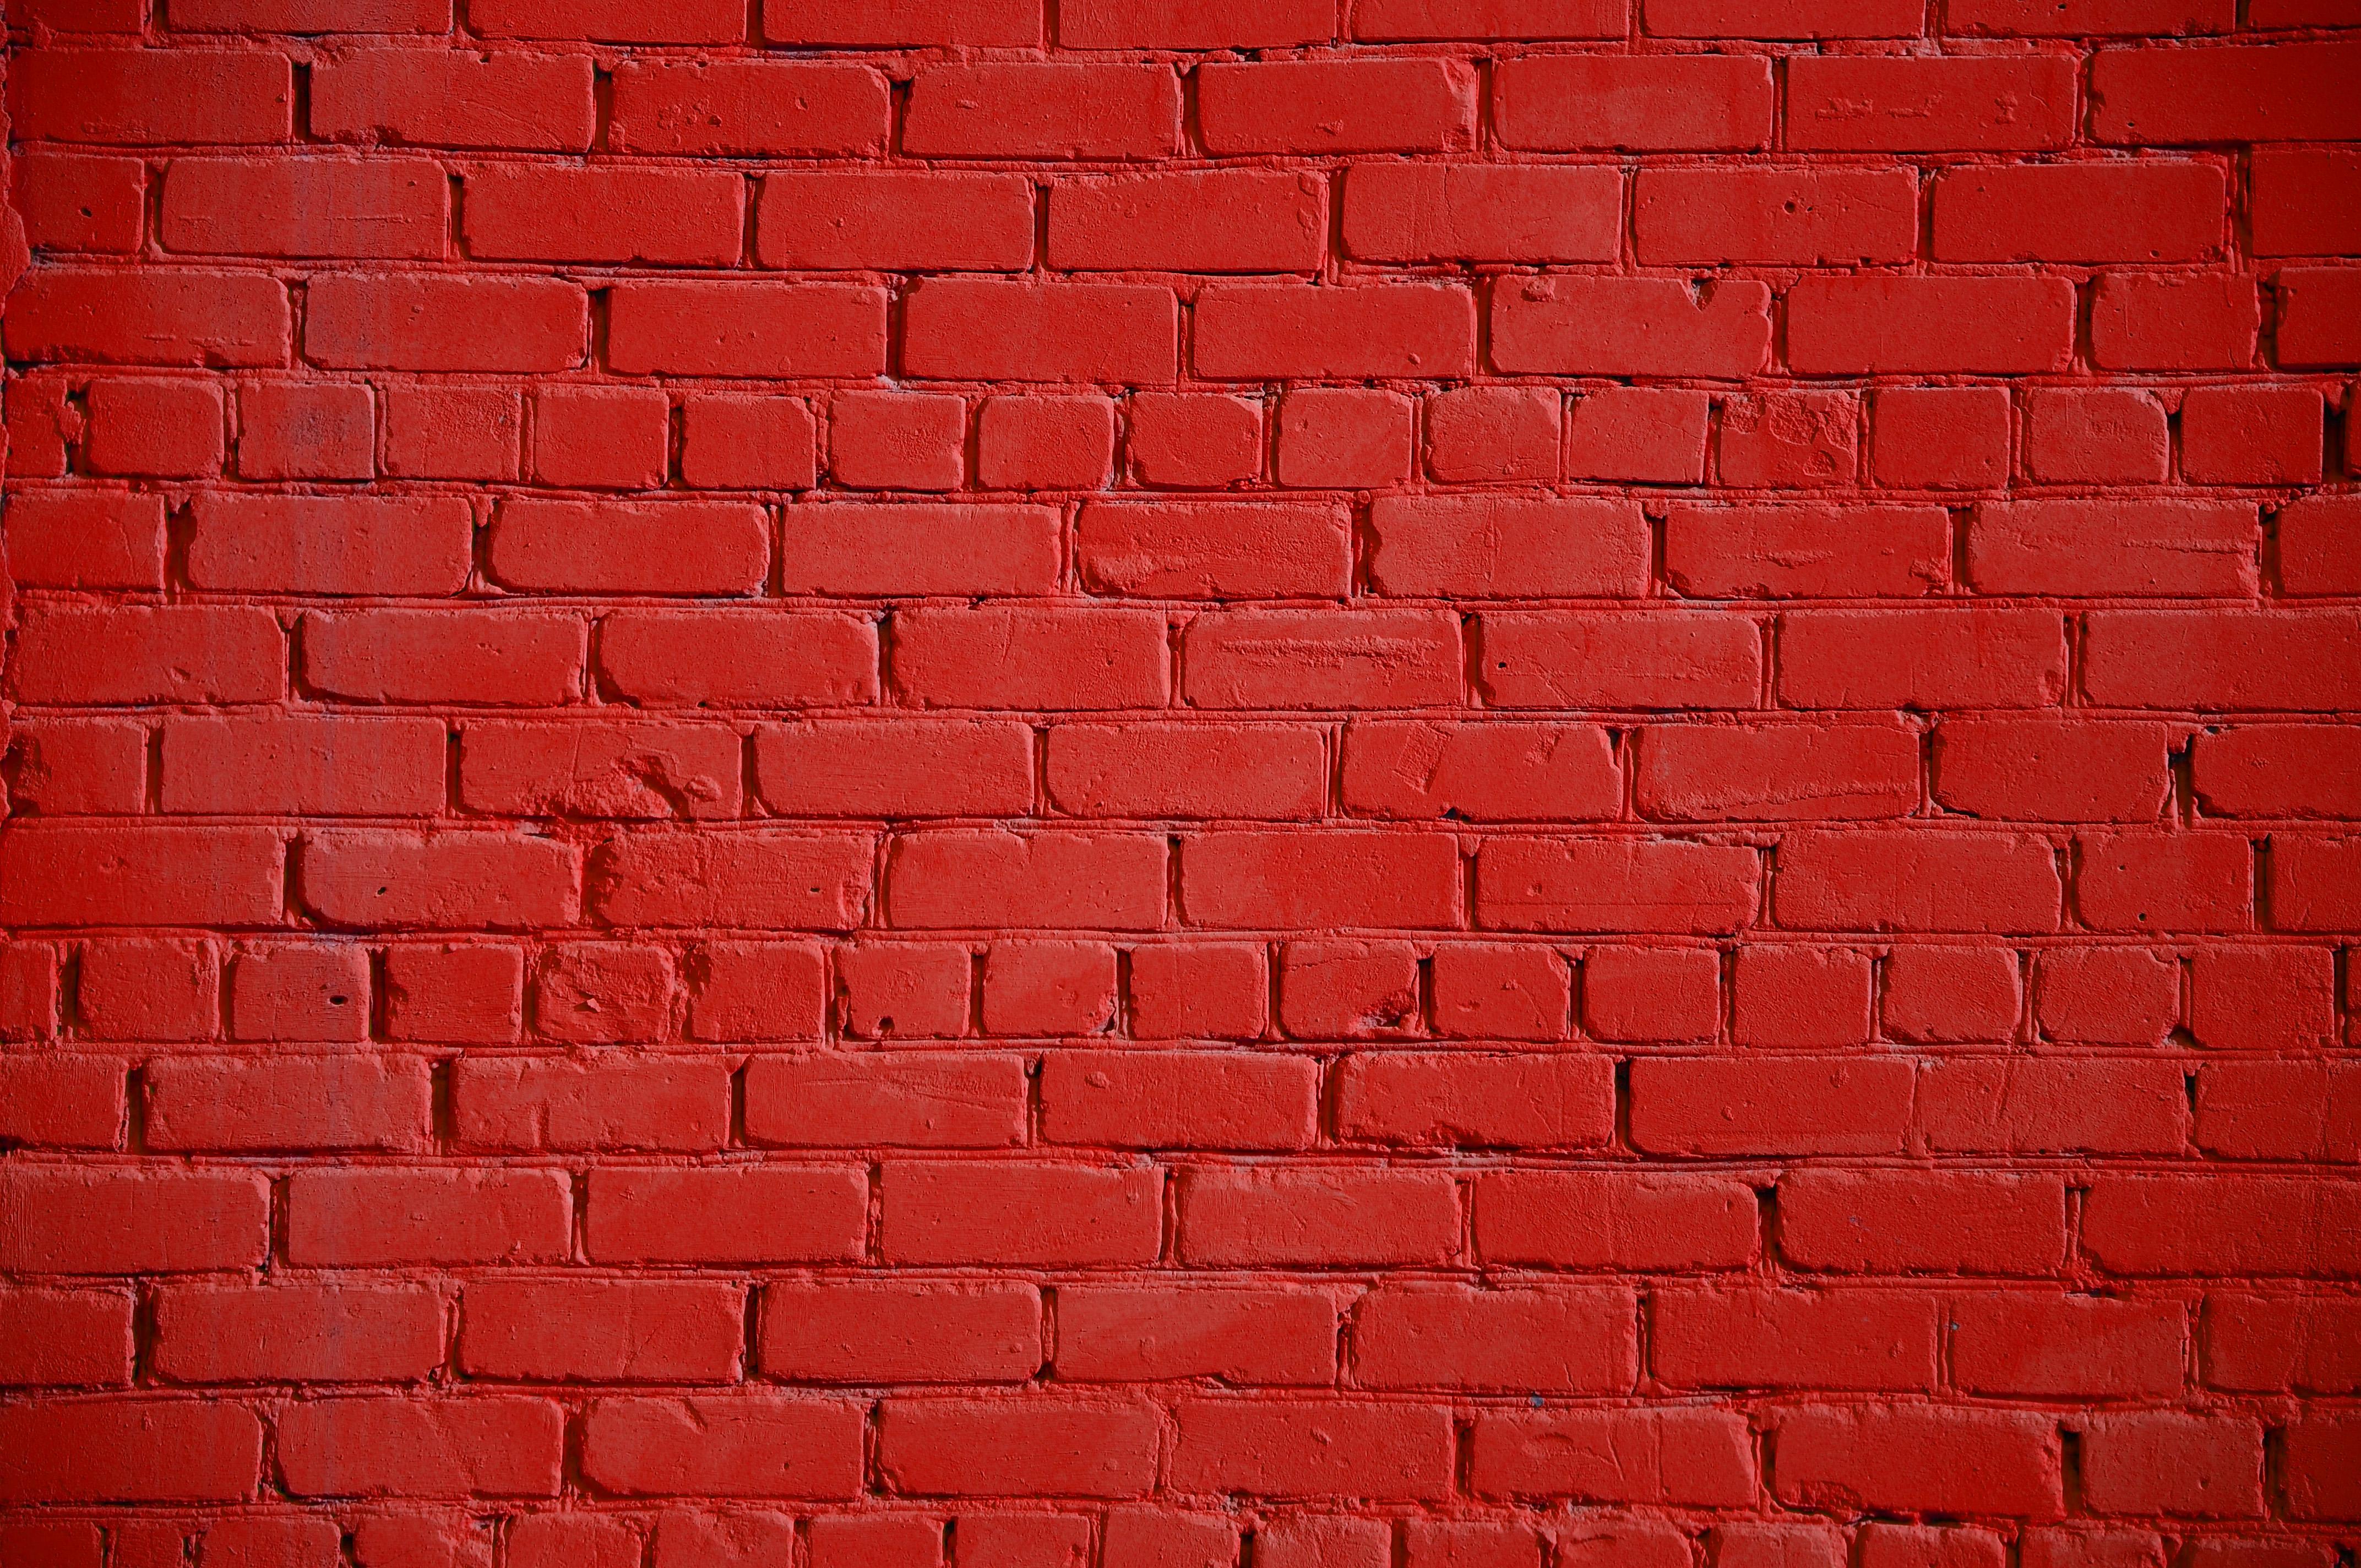 and red brick - photo #37